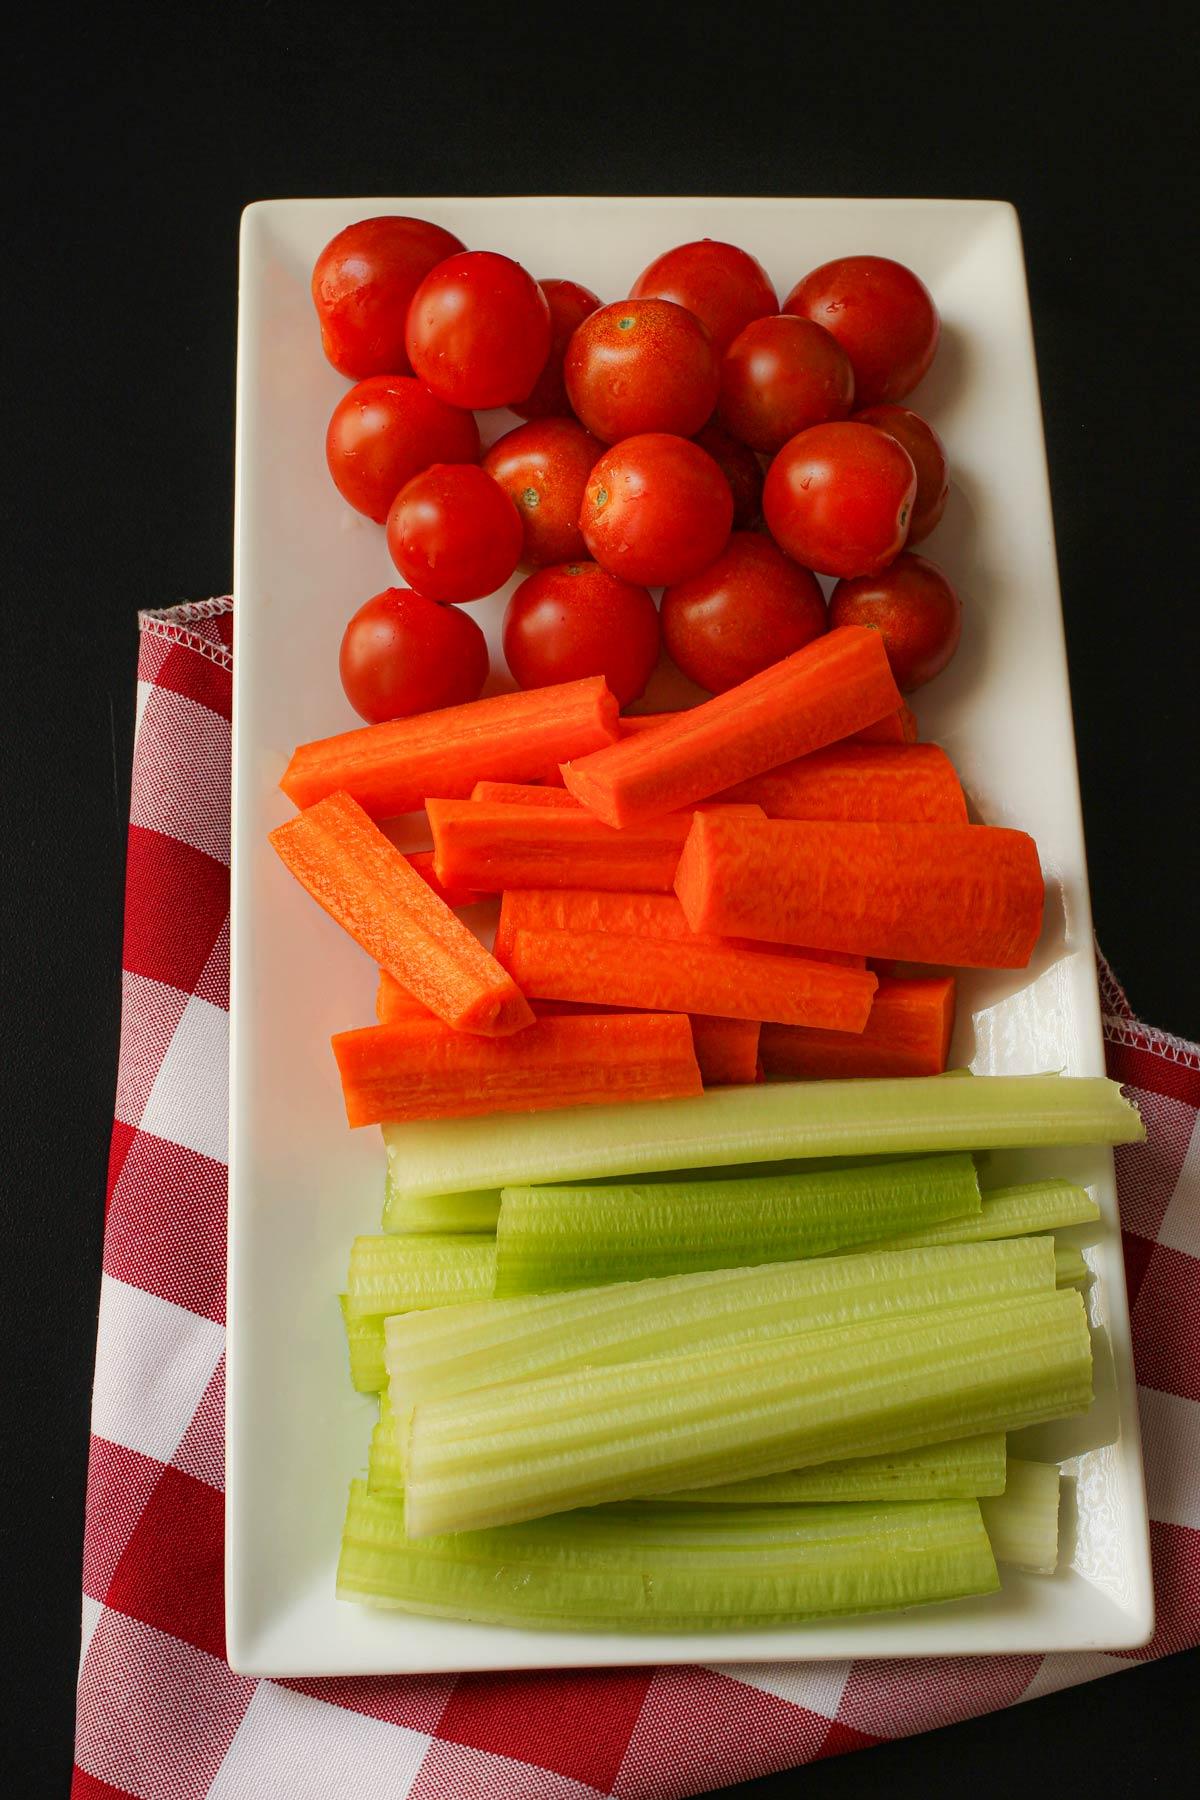 rectangular platter of cherry tomatoes, carrot sticks, and celery sticks.